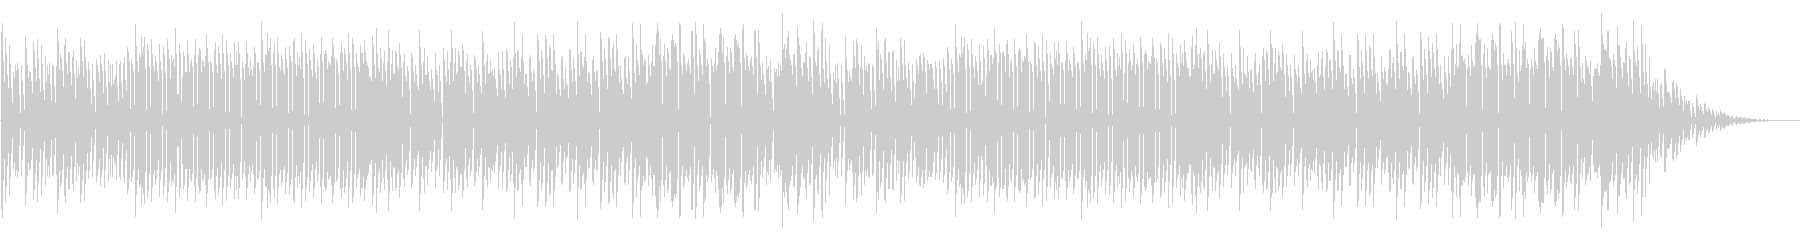 GB風アクションゲームのステージ曲の未再生の波形